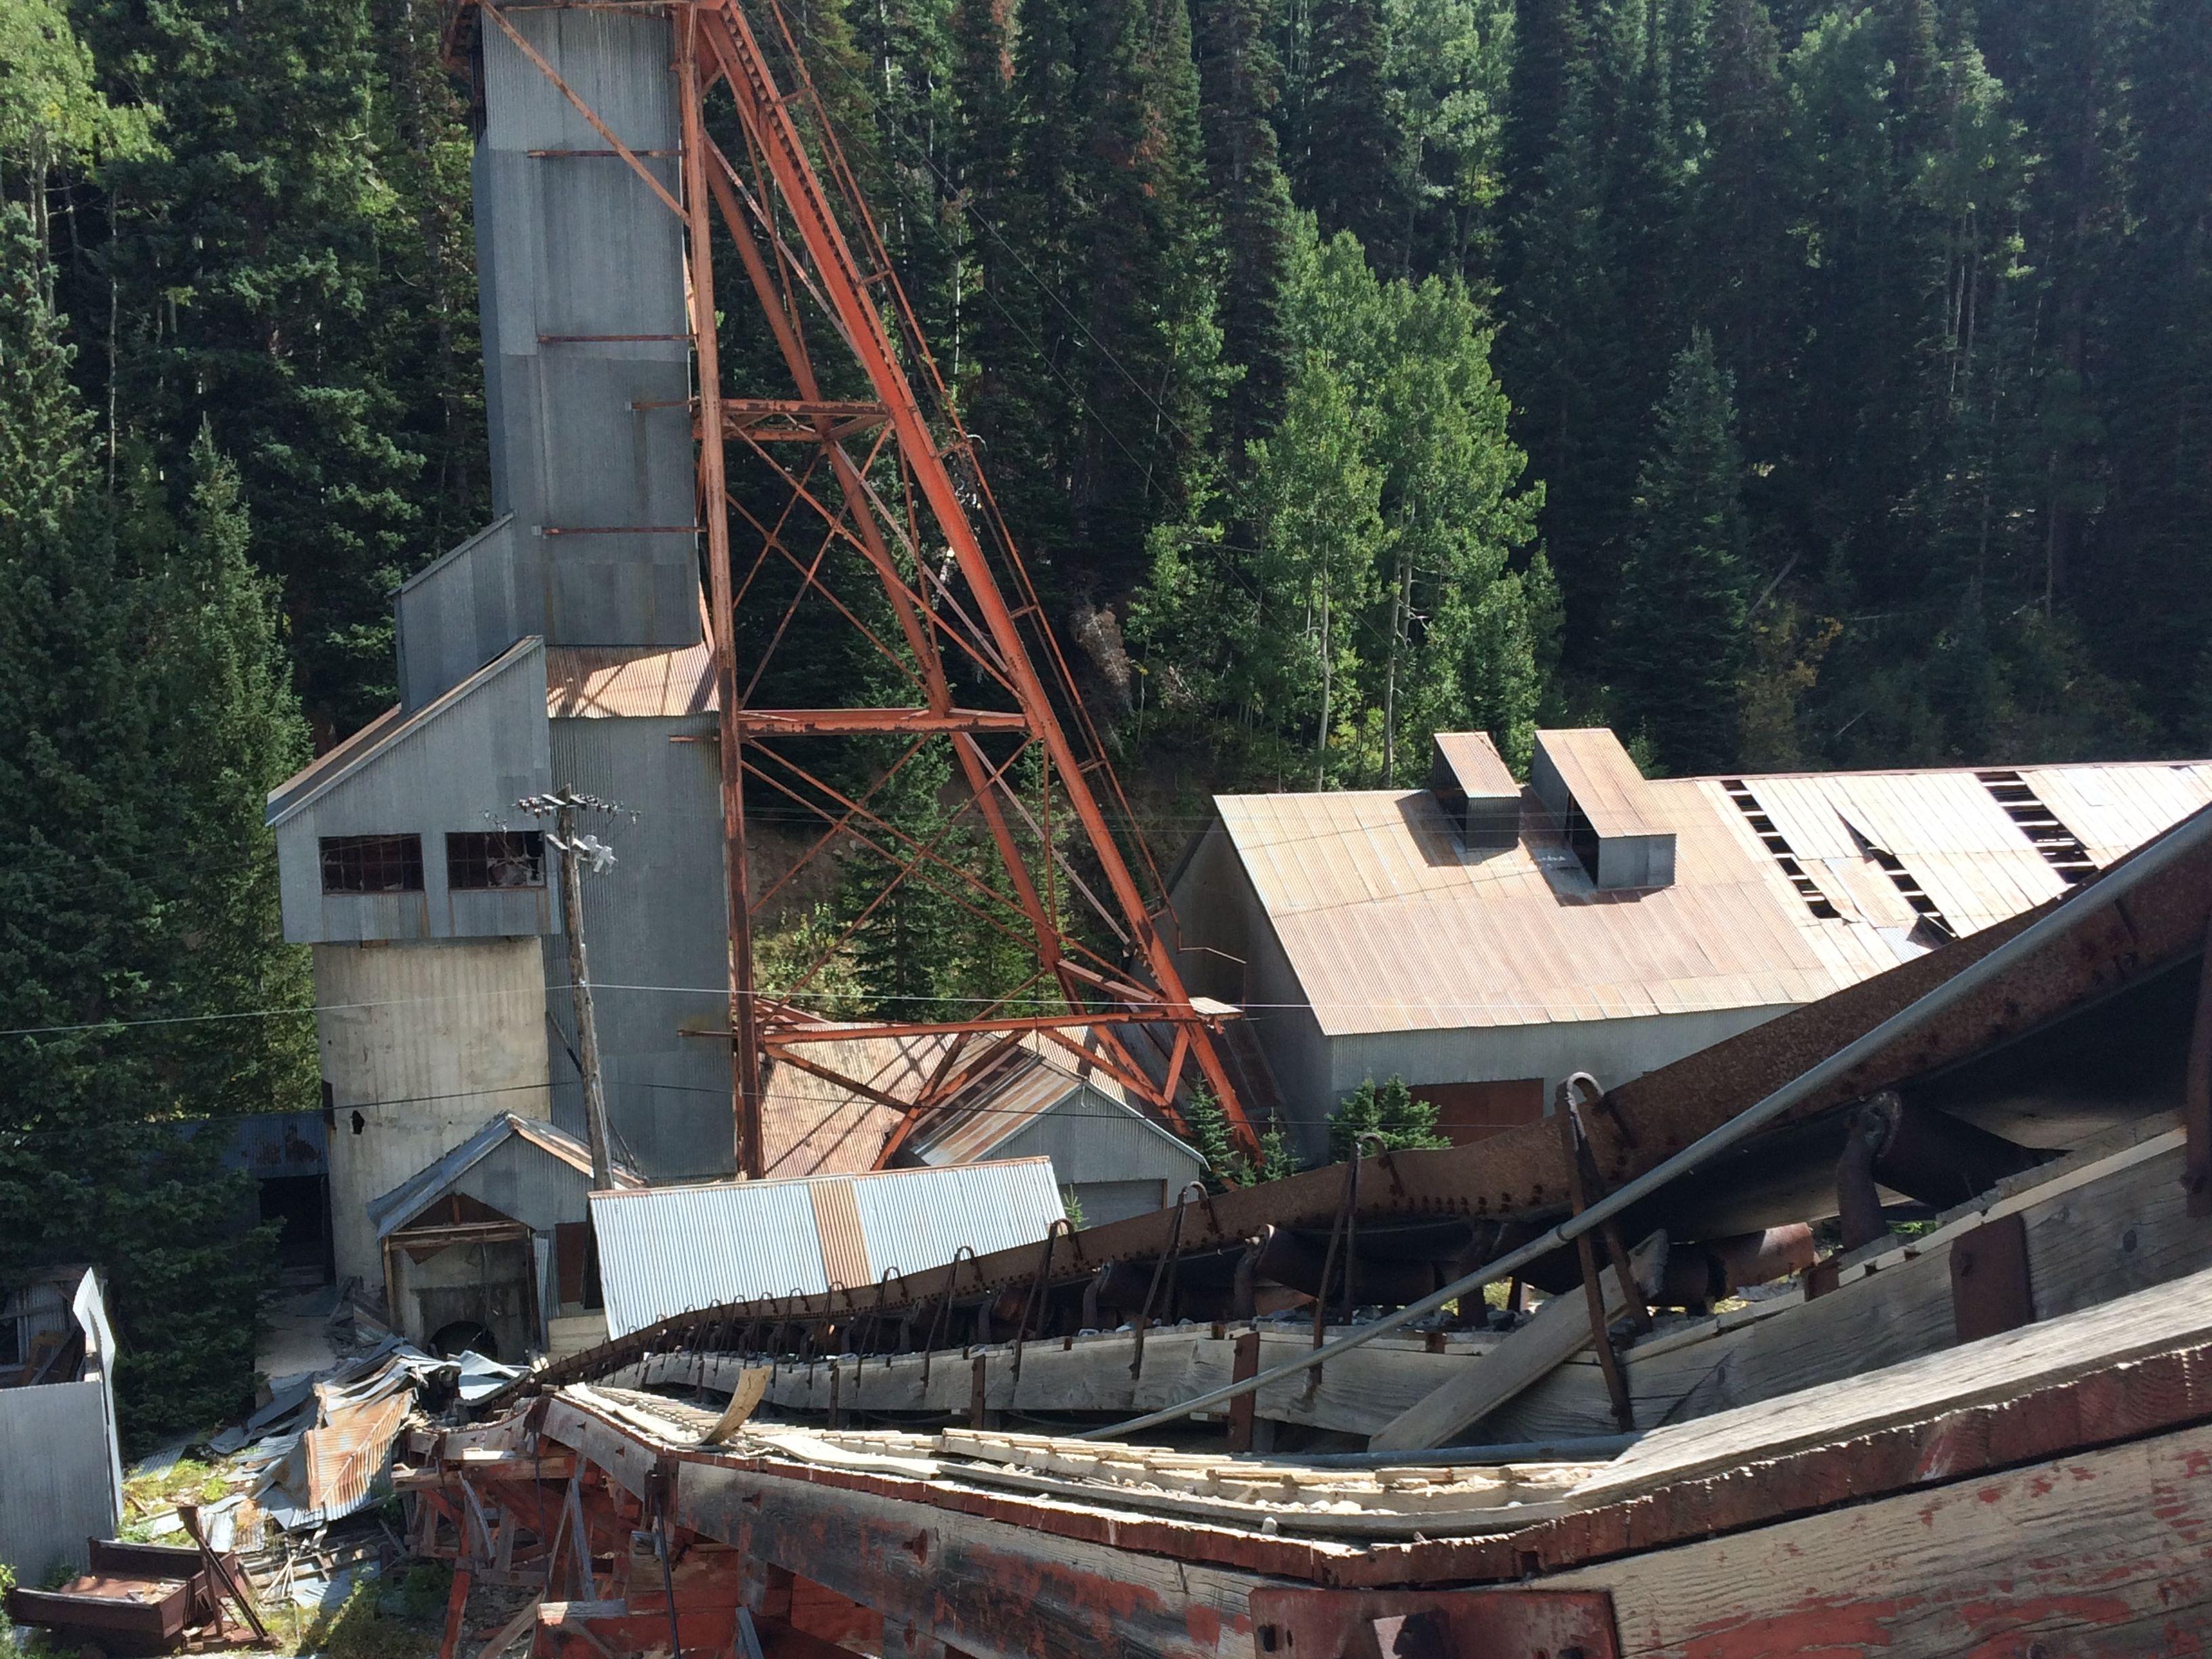 Thaynes hoist house and conveyor belt 5  f38fnw